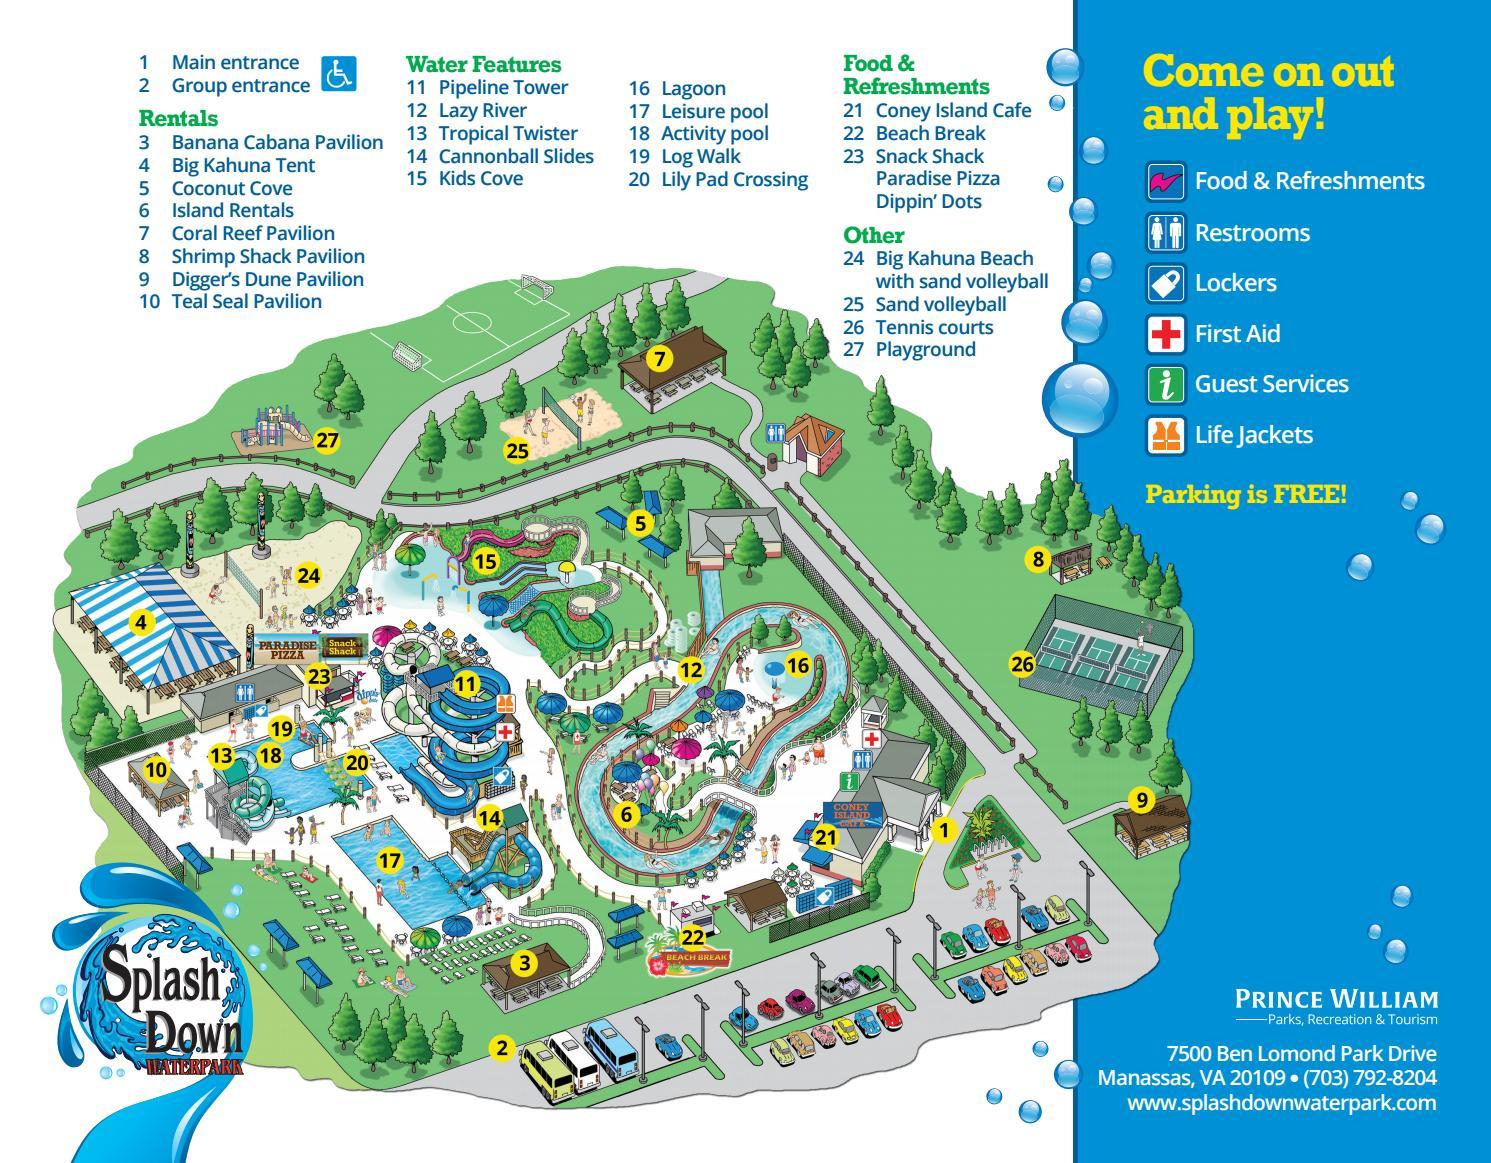 Splashdown Waterpark Map By Pwcdpr Issuu